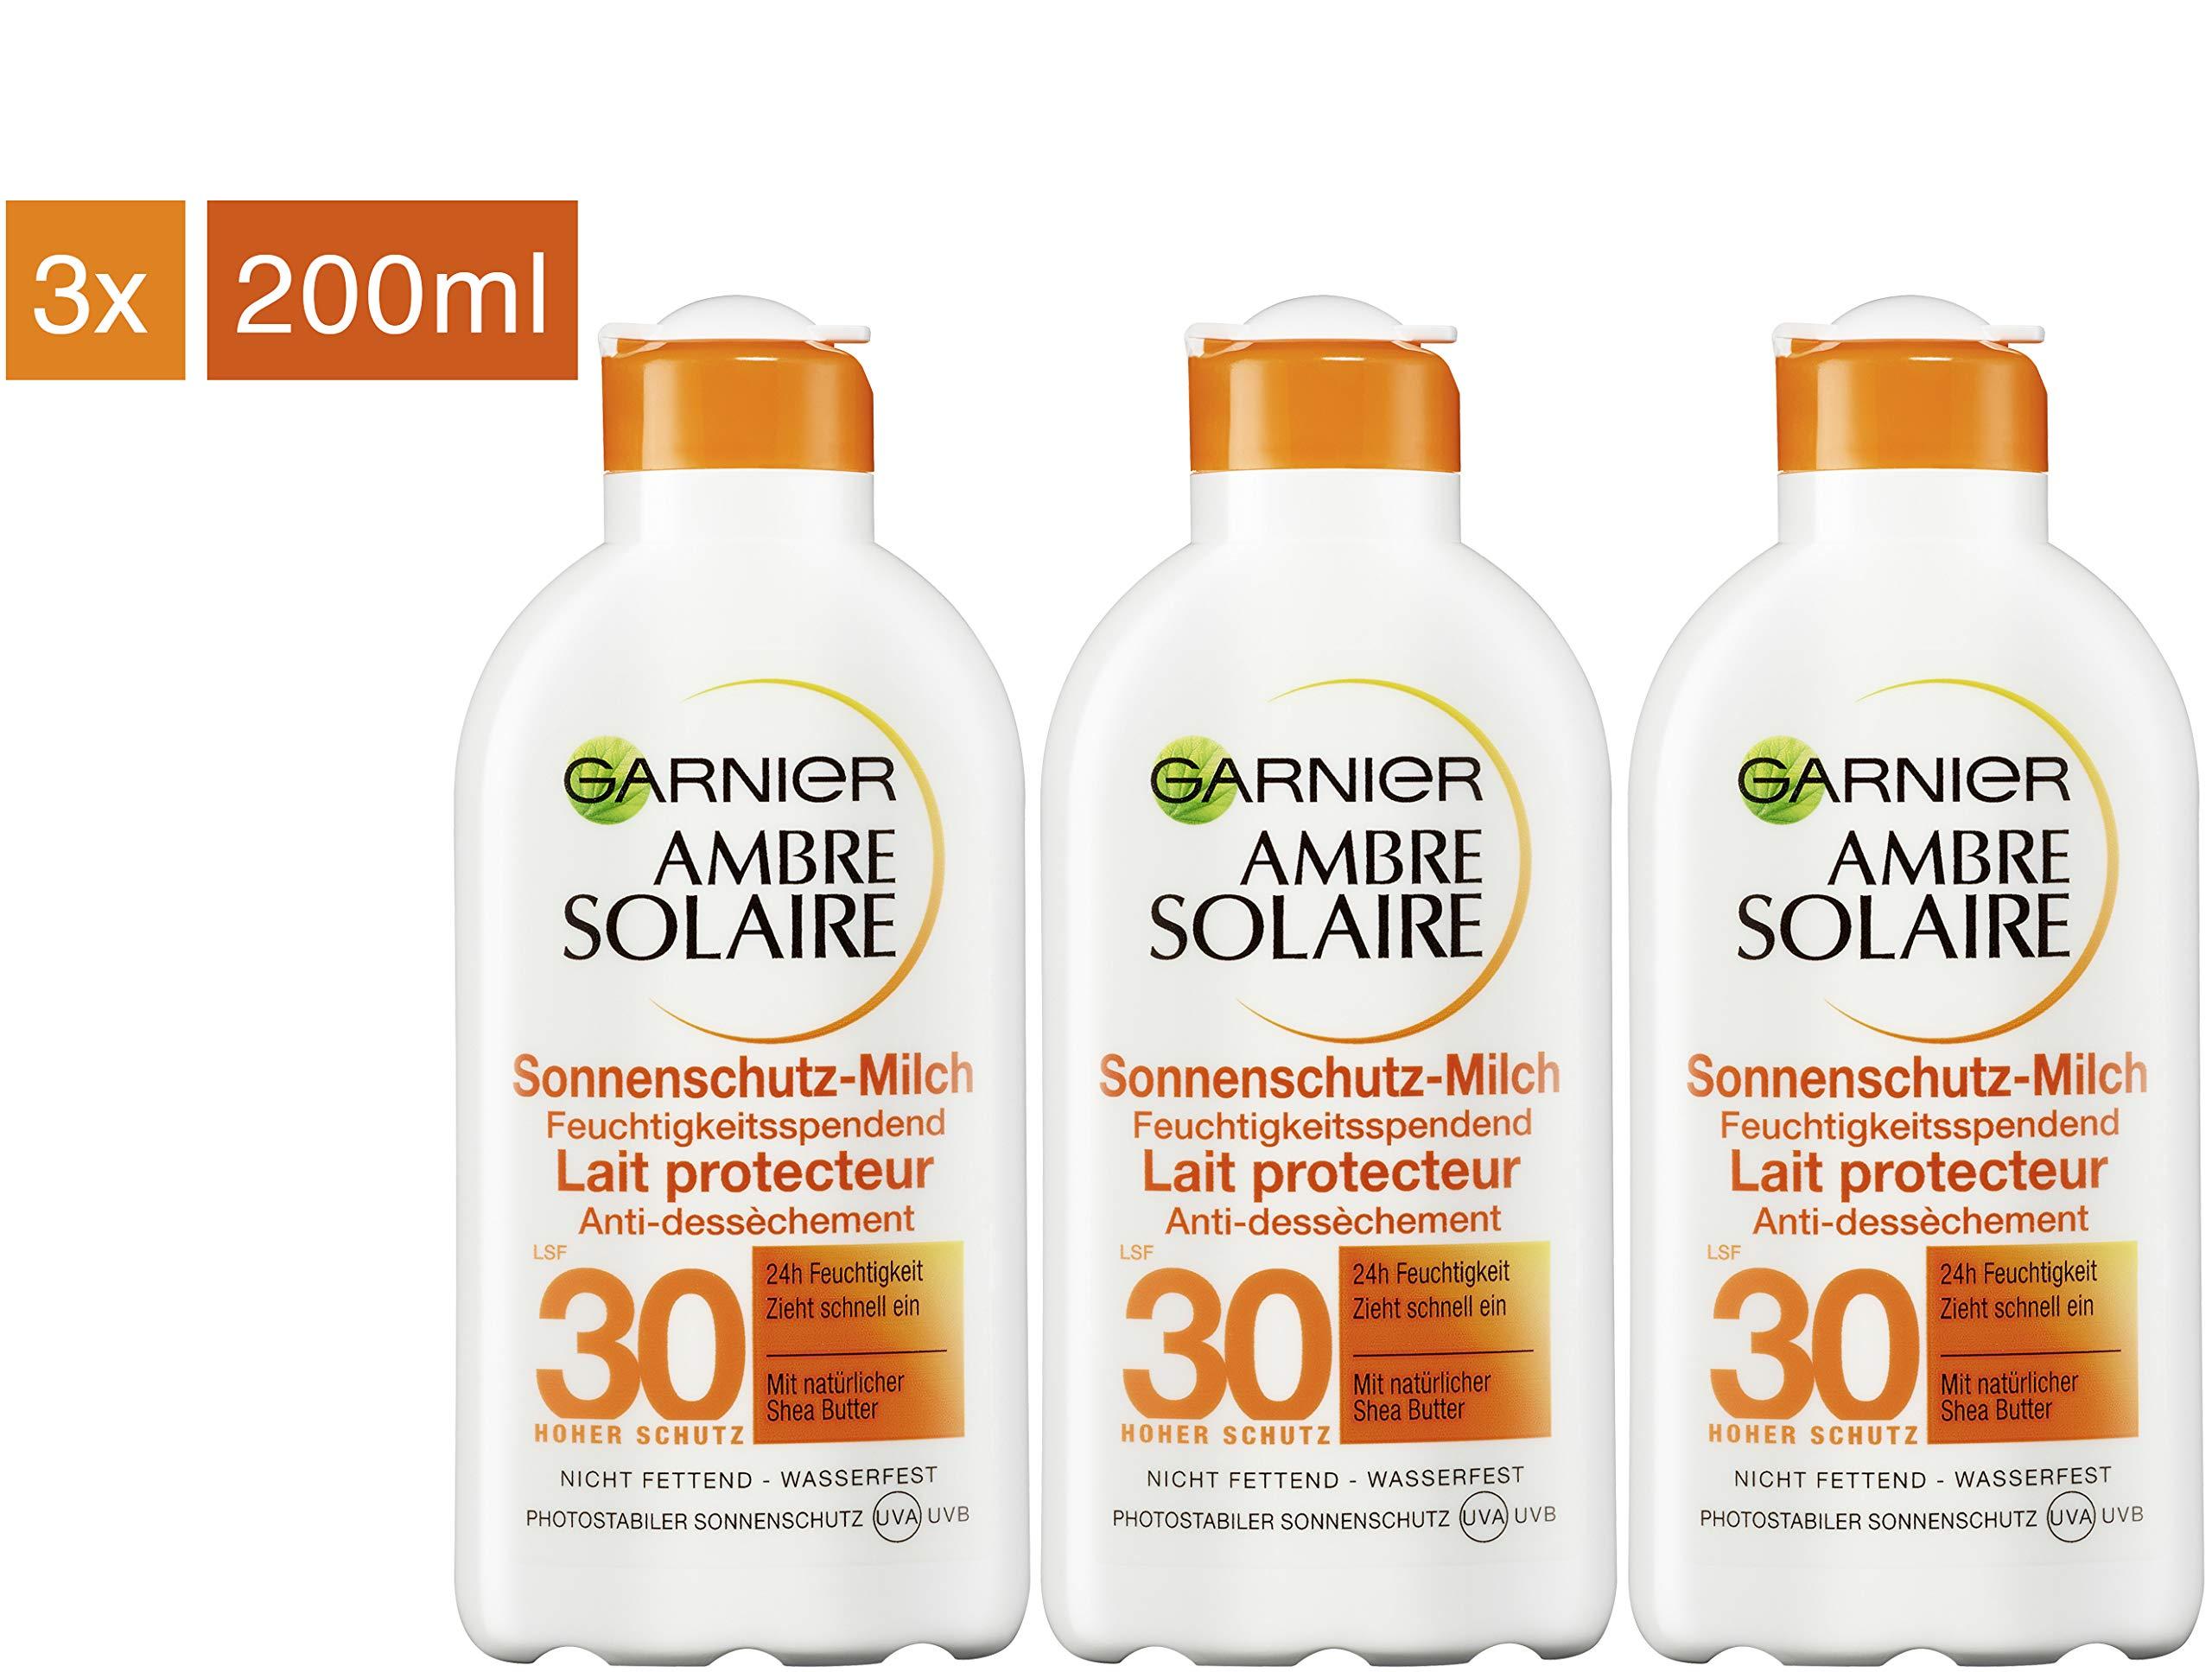 Garnier Ambre Solaire Delial Lotion SPF 30, 3-pack (3 x 200 ml)